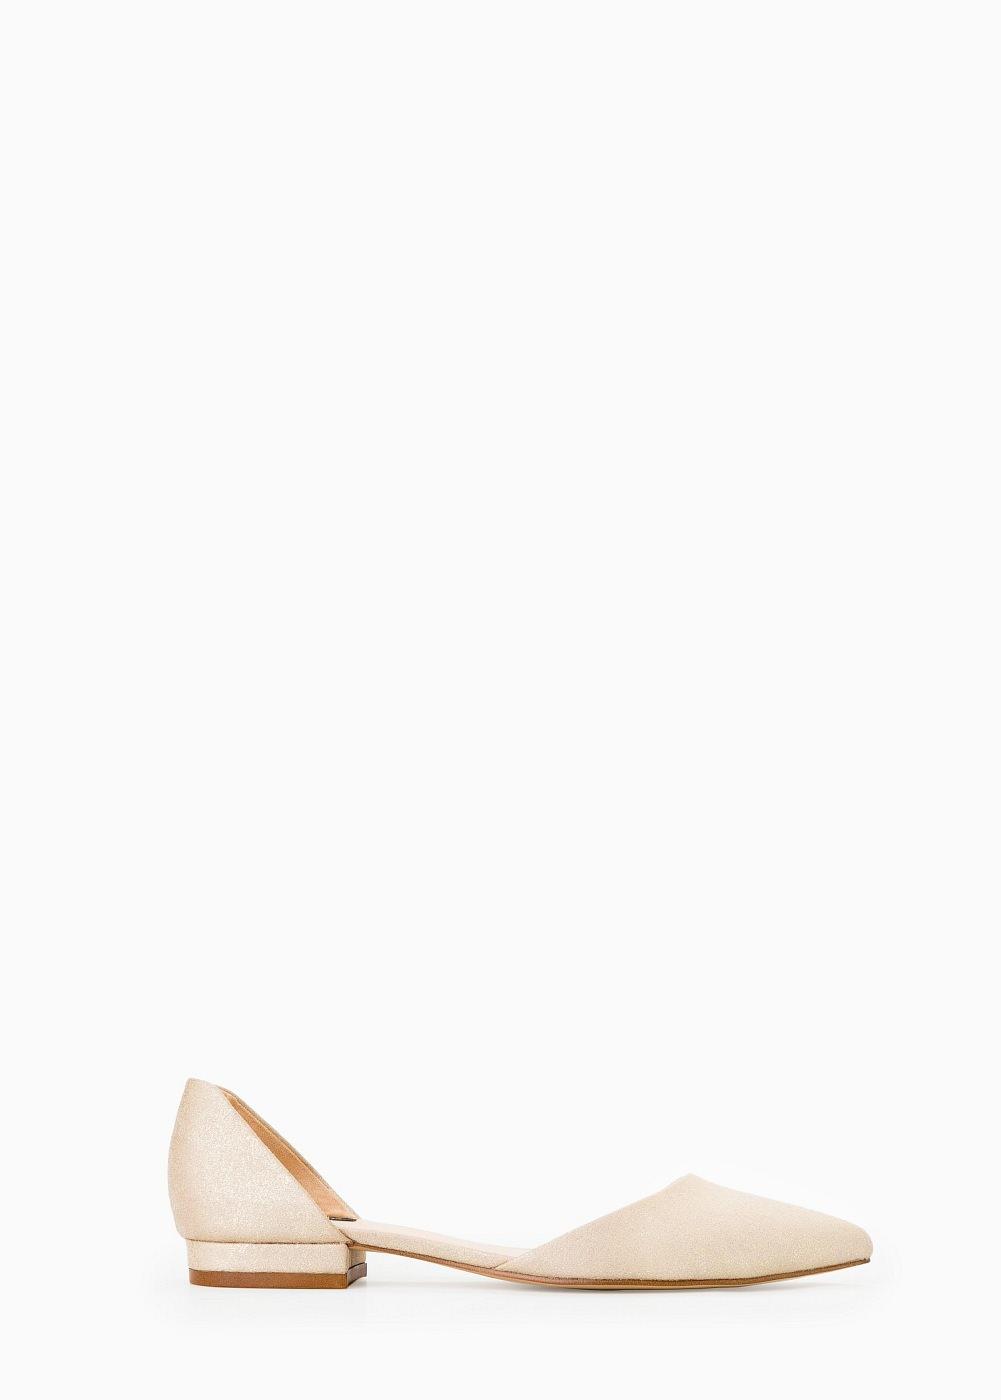 Scarpe a punta, 29, 99 euro